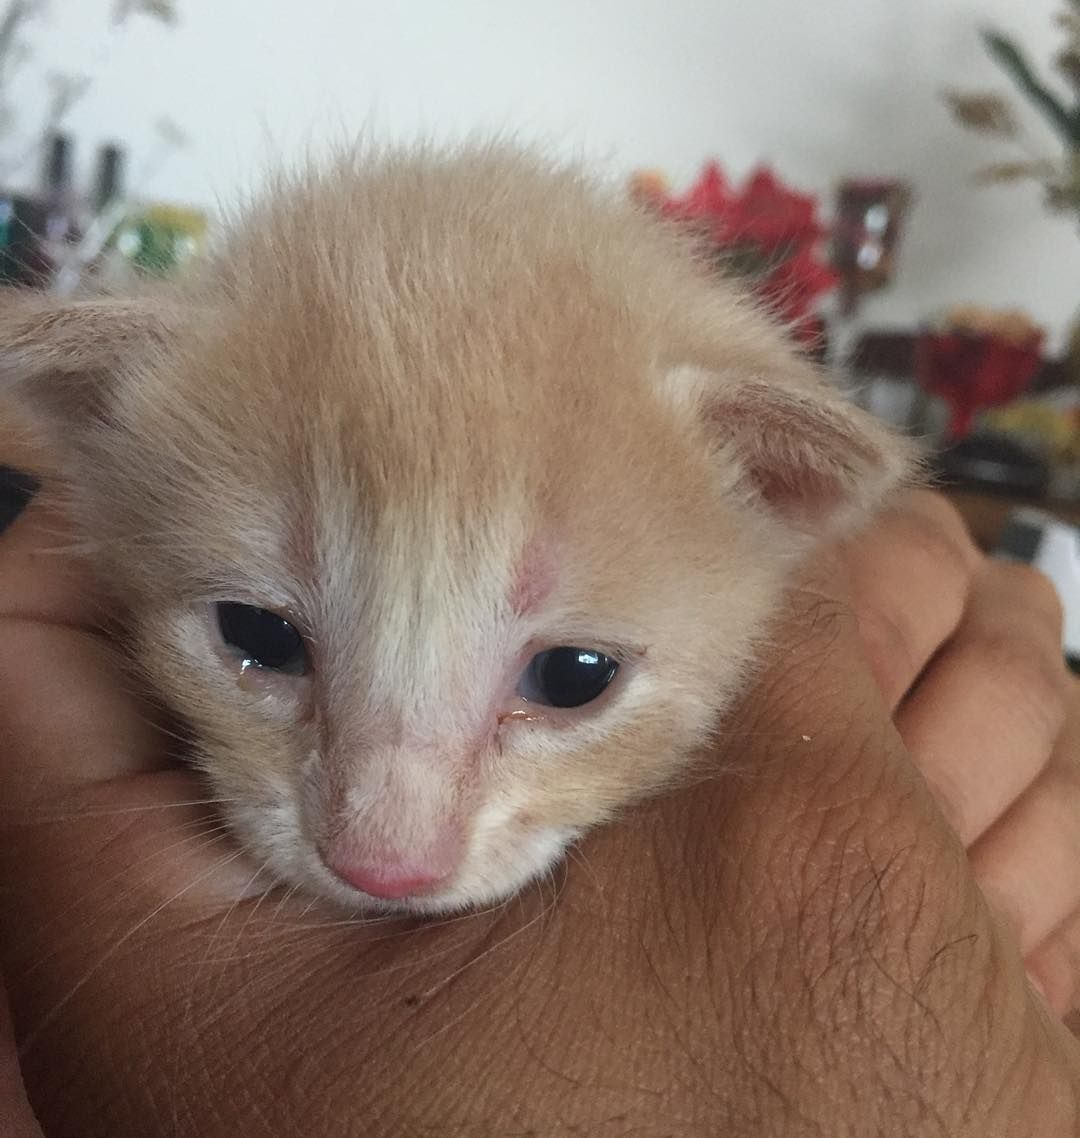 provocative-planet-pics-please.tumblr.com Feliz 2016 ! #cat #babies #baby #loved #lindos #fight #naodormen #filhotes #gatos #nosleep #adoraveis #mother #son #mae #filho #anonovo #home #puppies #puppy #cateyes #nature #natureza #planets #bichos #newyear #athome #comela #travelingtogheter #universo #myfionce by francisco_limaiv_ https://www.instagram.com/p/BAAN64Yzhr1/